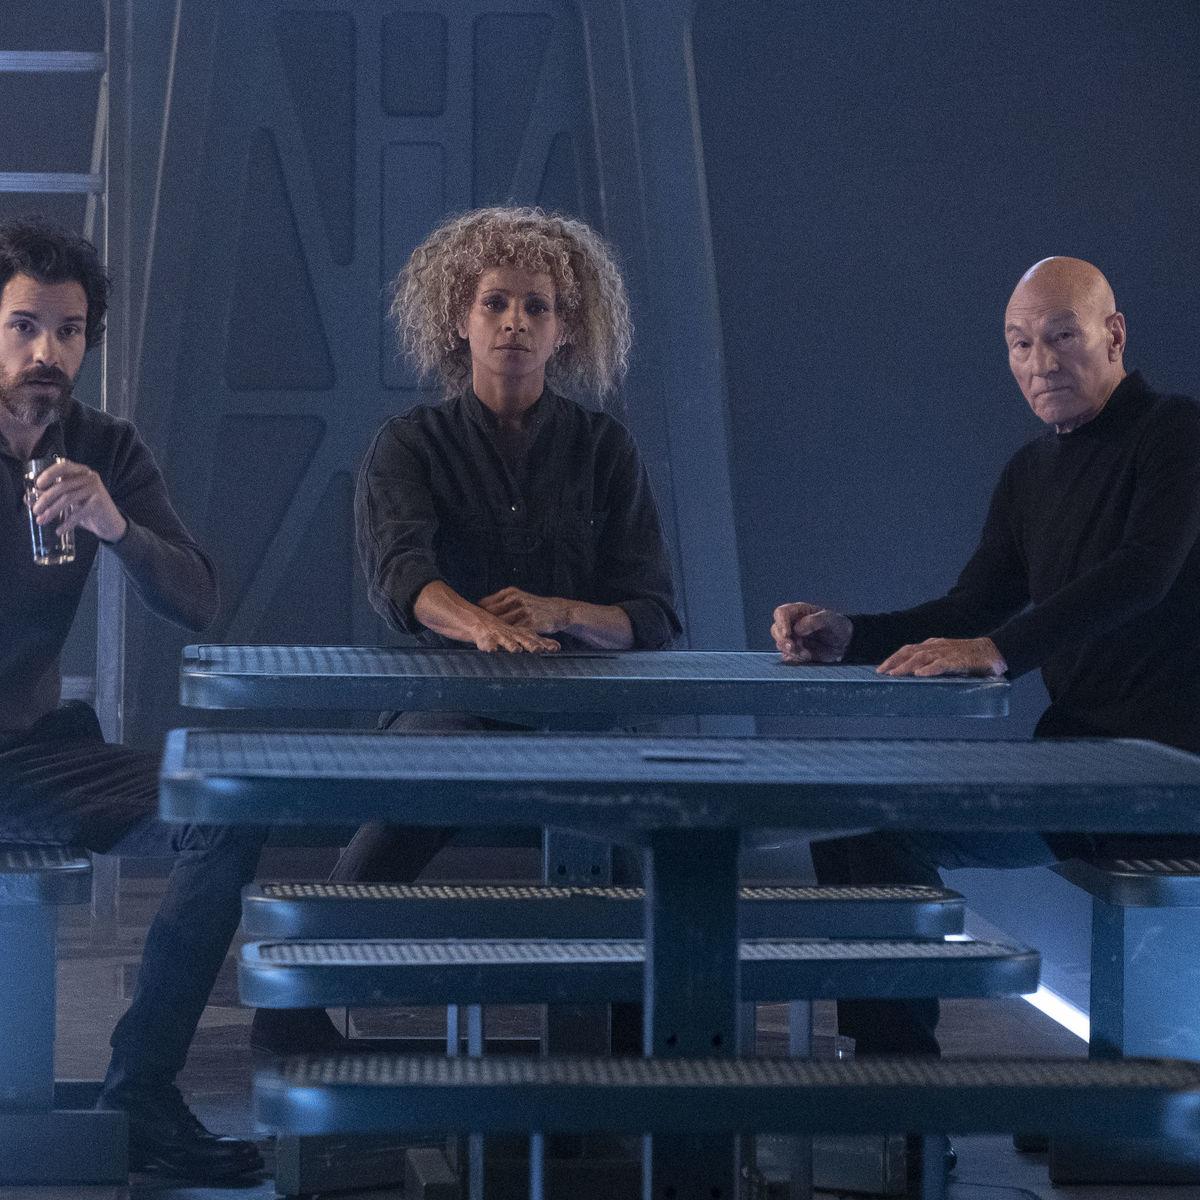 Picard group